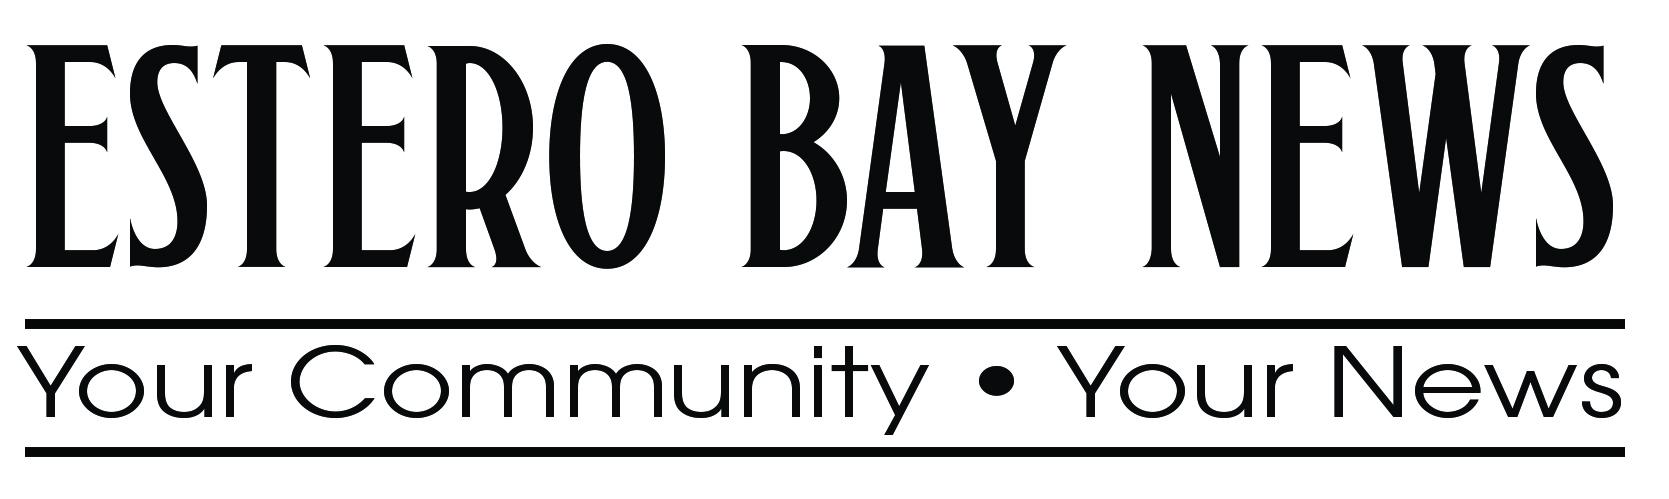 EsteroBayNews_Logo.jpg